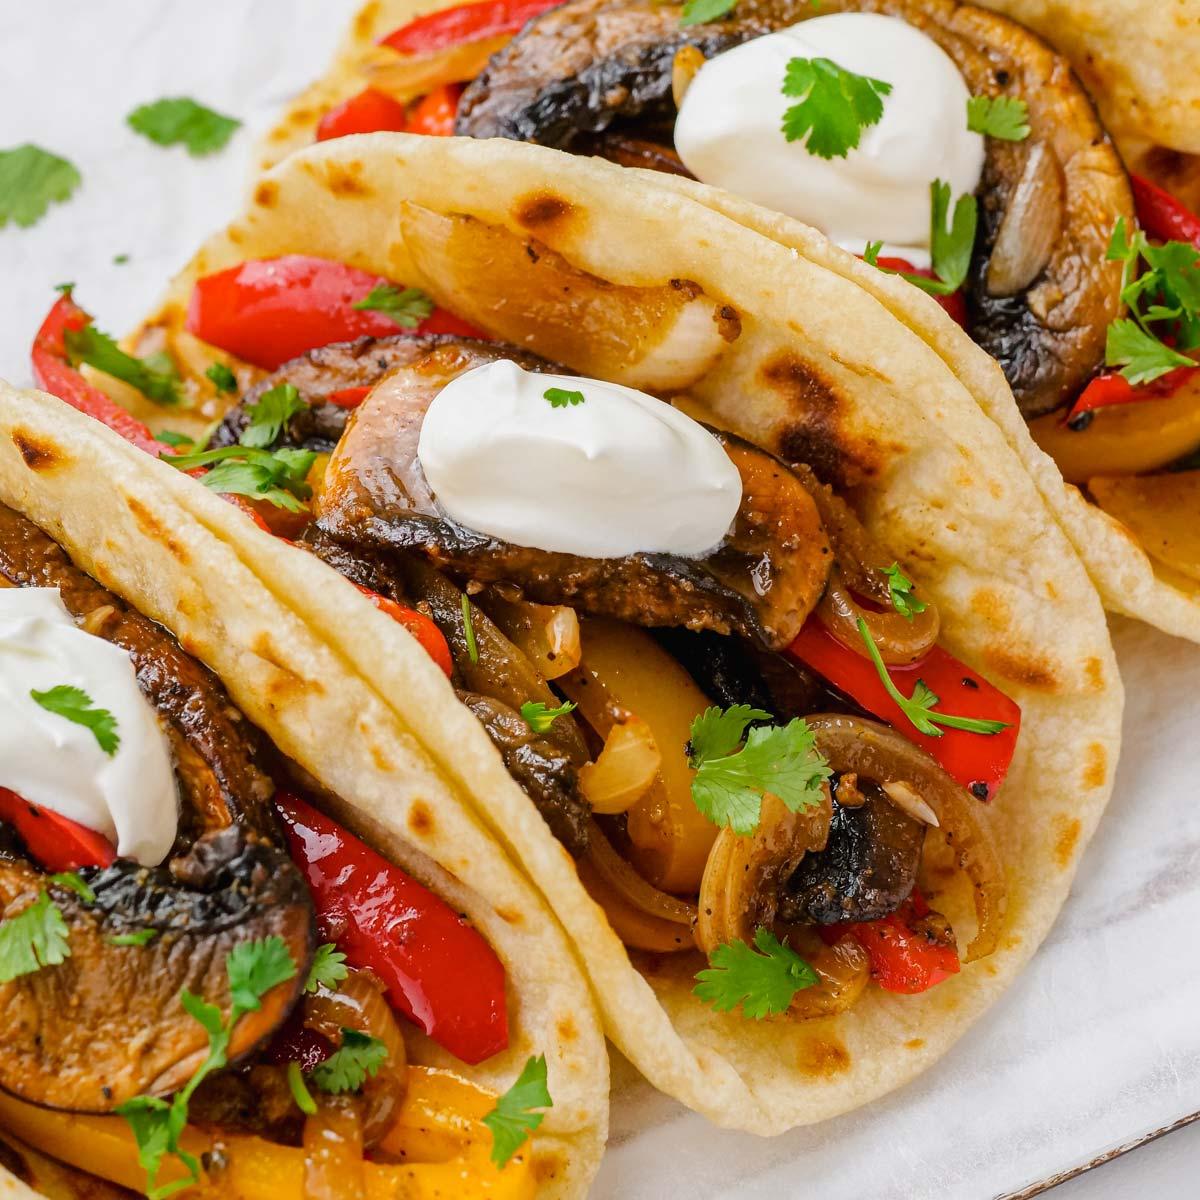 Vegan Fajitas - Texanerin Baking